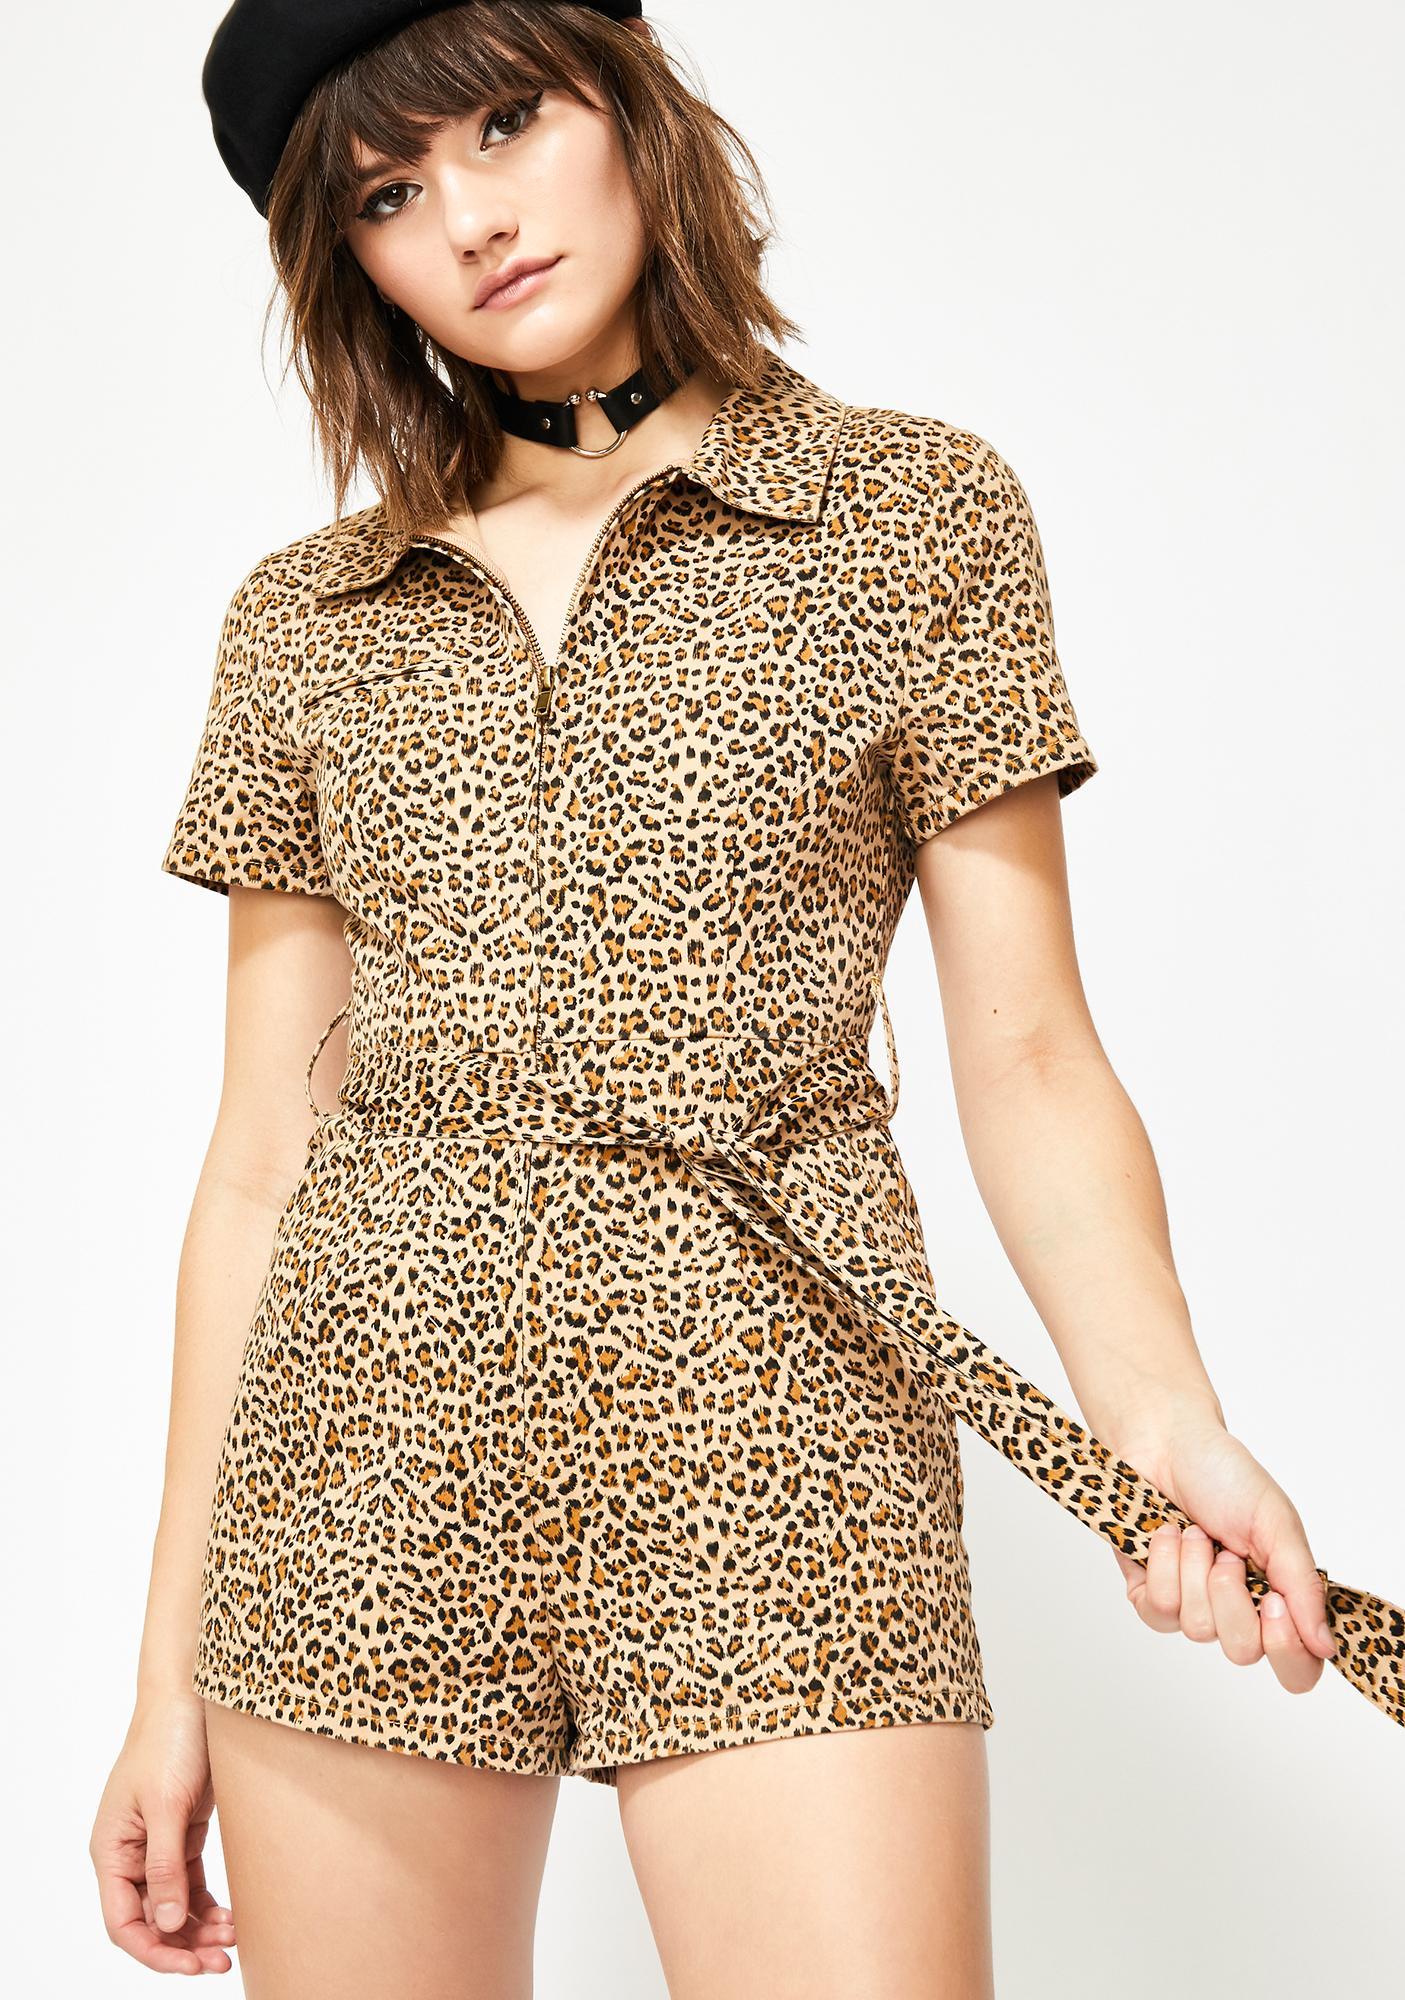 Slayage Chic Leopard Romper